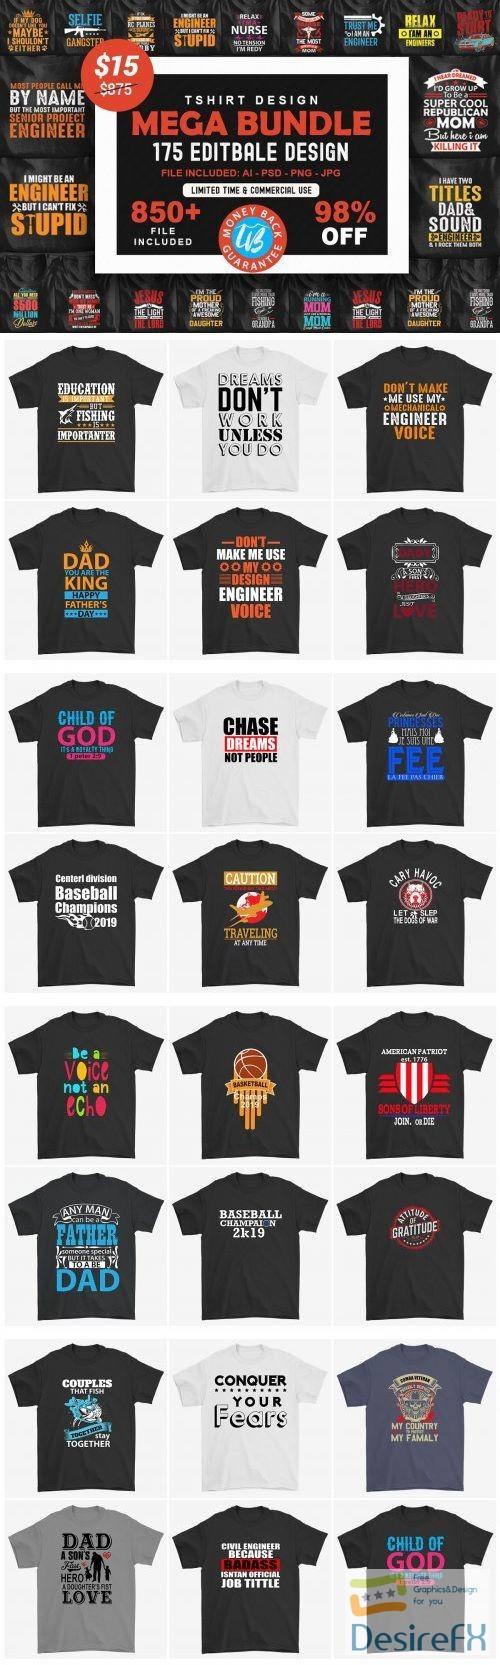 t-shirts-prints - 175 Editable T-shirt Designs - 3885266